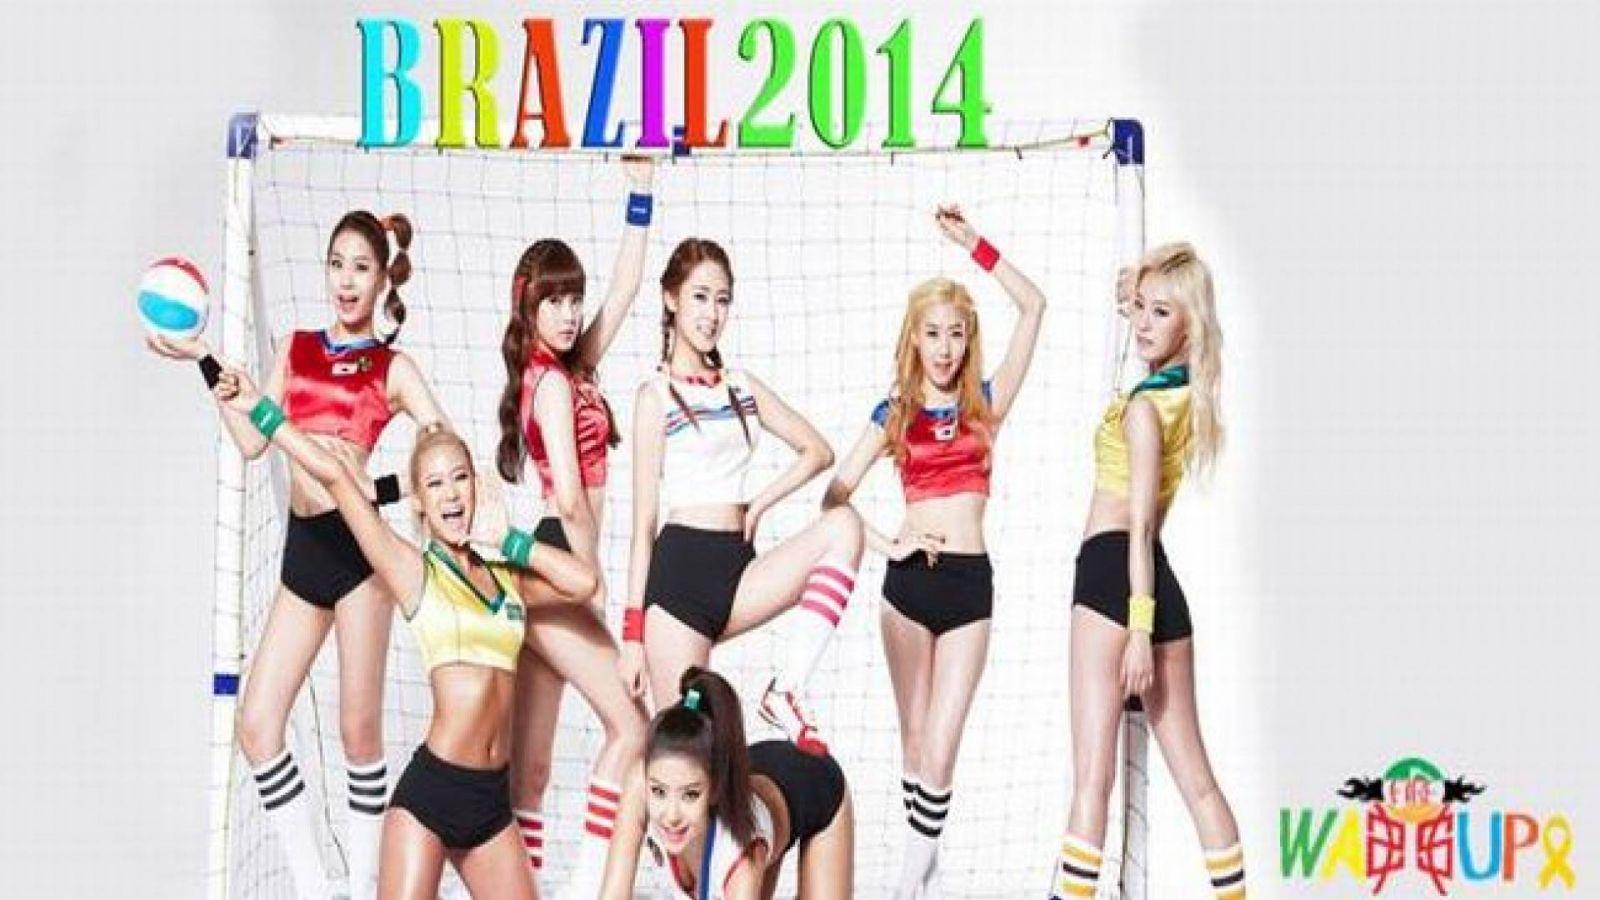 Wa$$up vem ao Brasil © Wassup Oficial Facebook Page